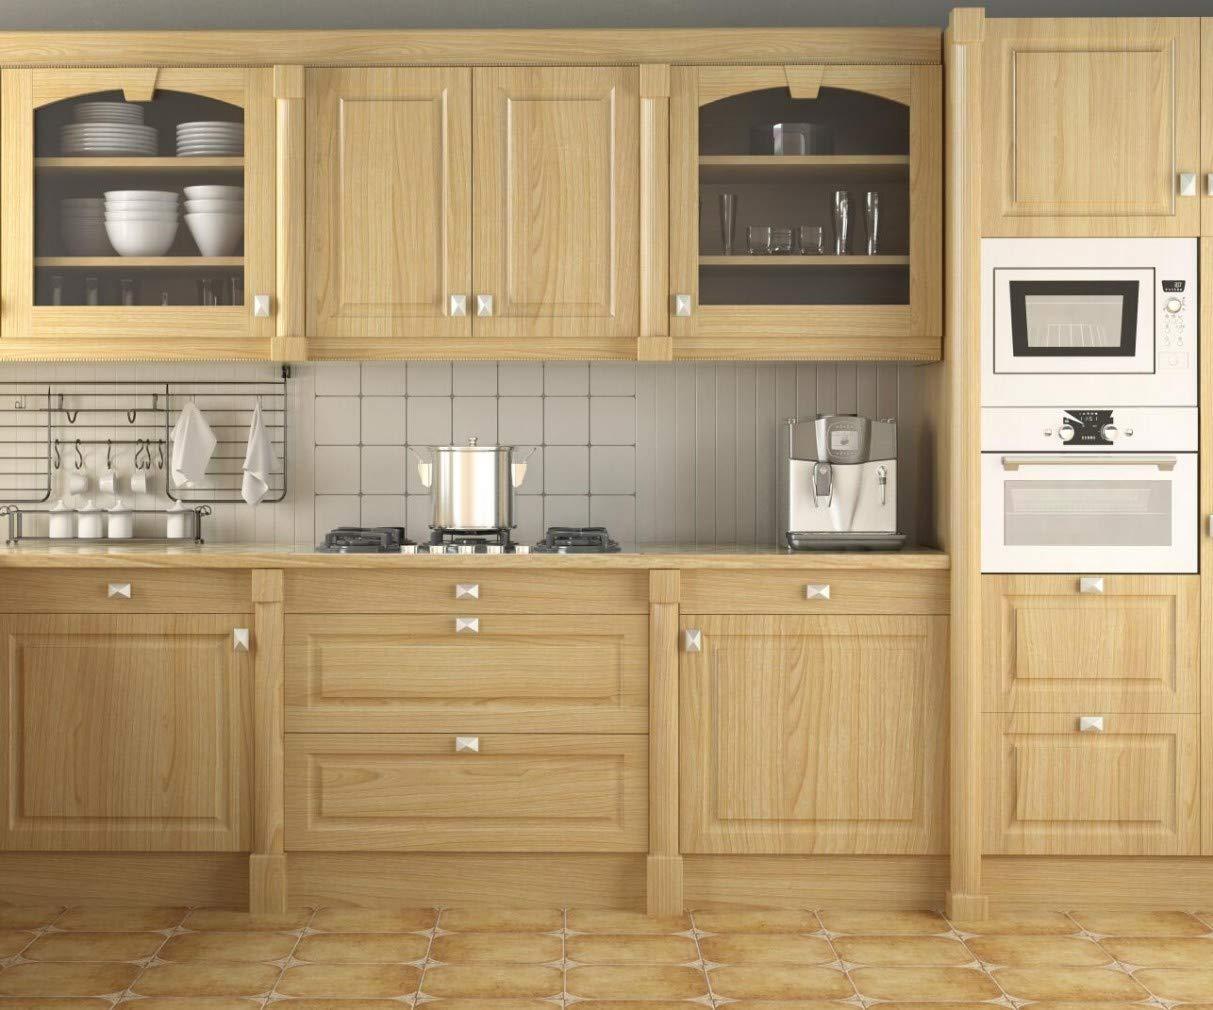 Amazoncom Wood Classic Kitchen Photo Backdrop Neutral Wooden 1213x1010